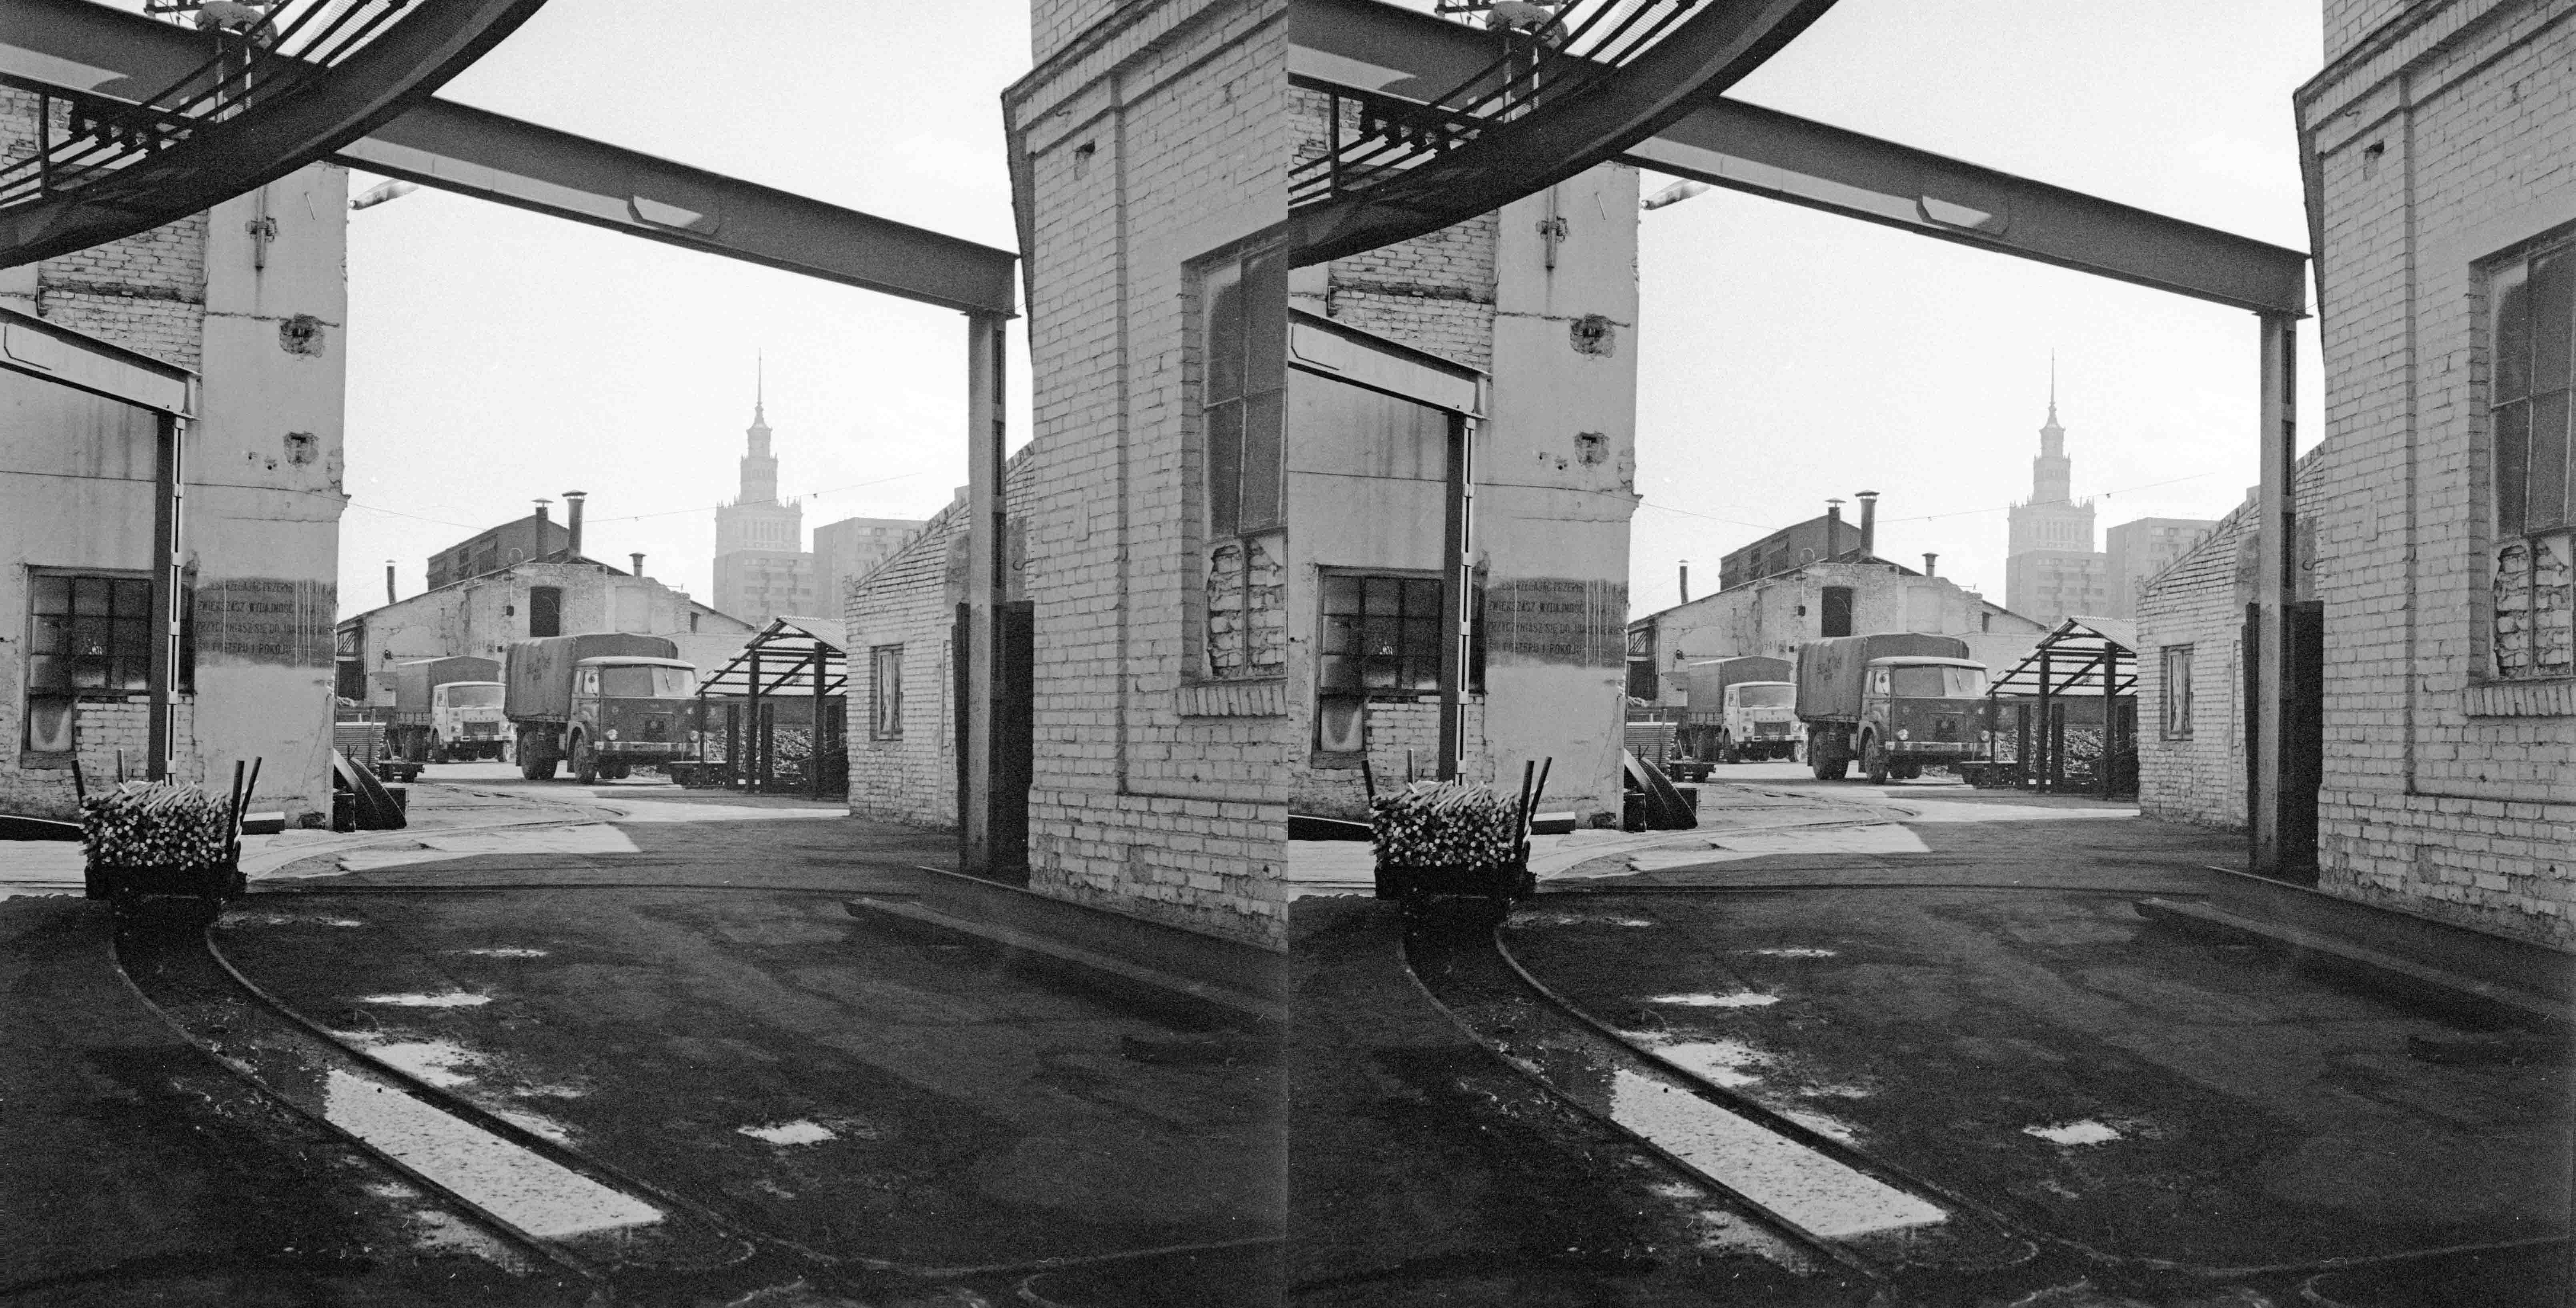 Fot. Zygmunt Swiatek / East News  Teren fabryki Norblin, Warszawa, 11.04.1973